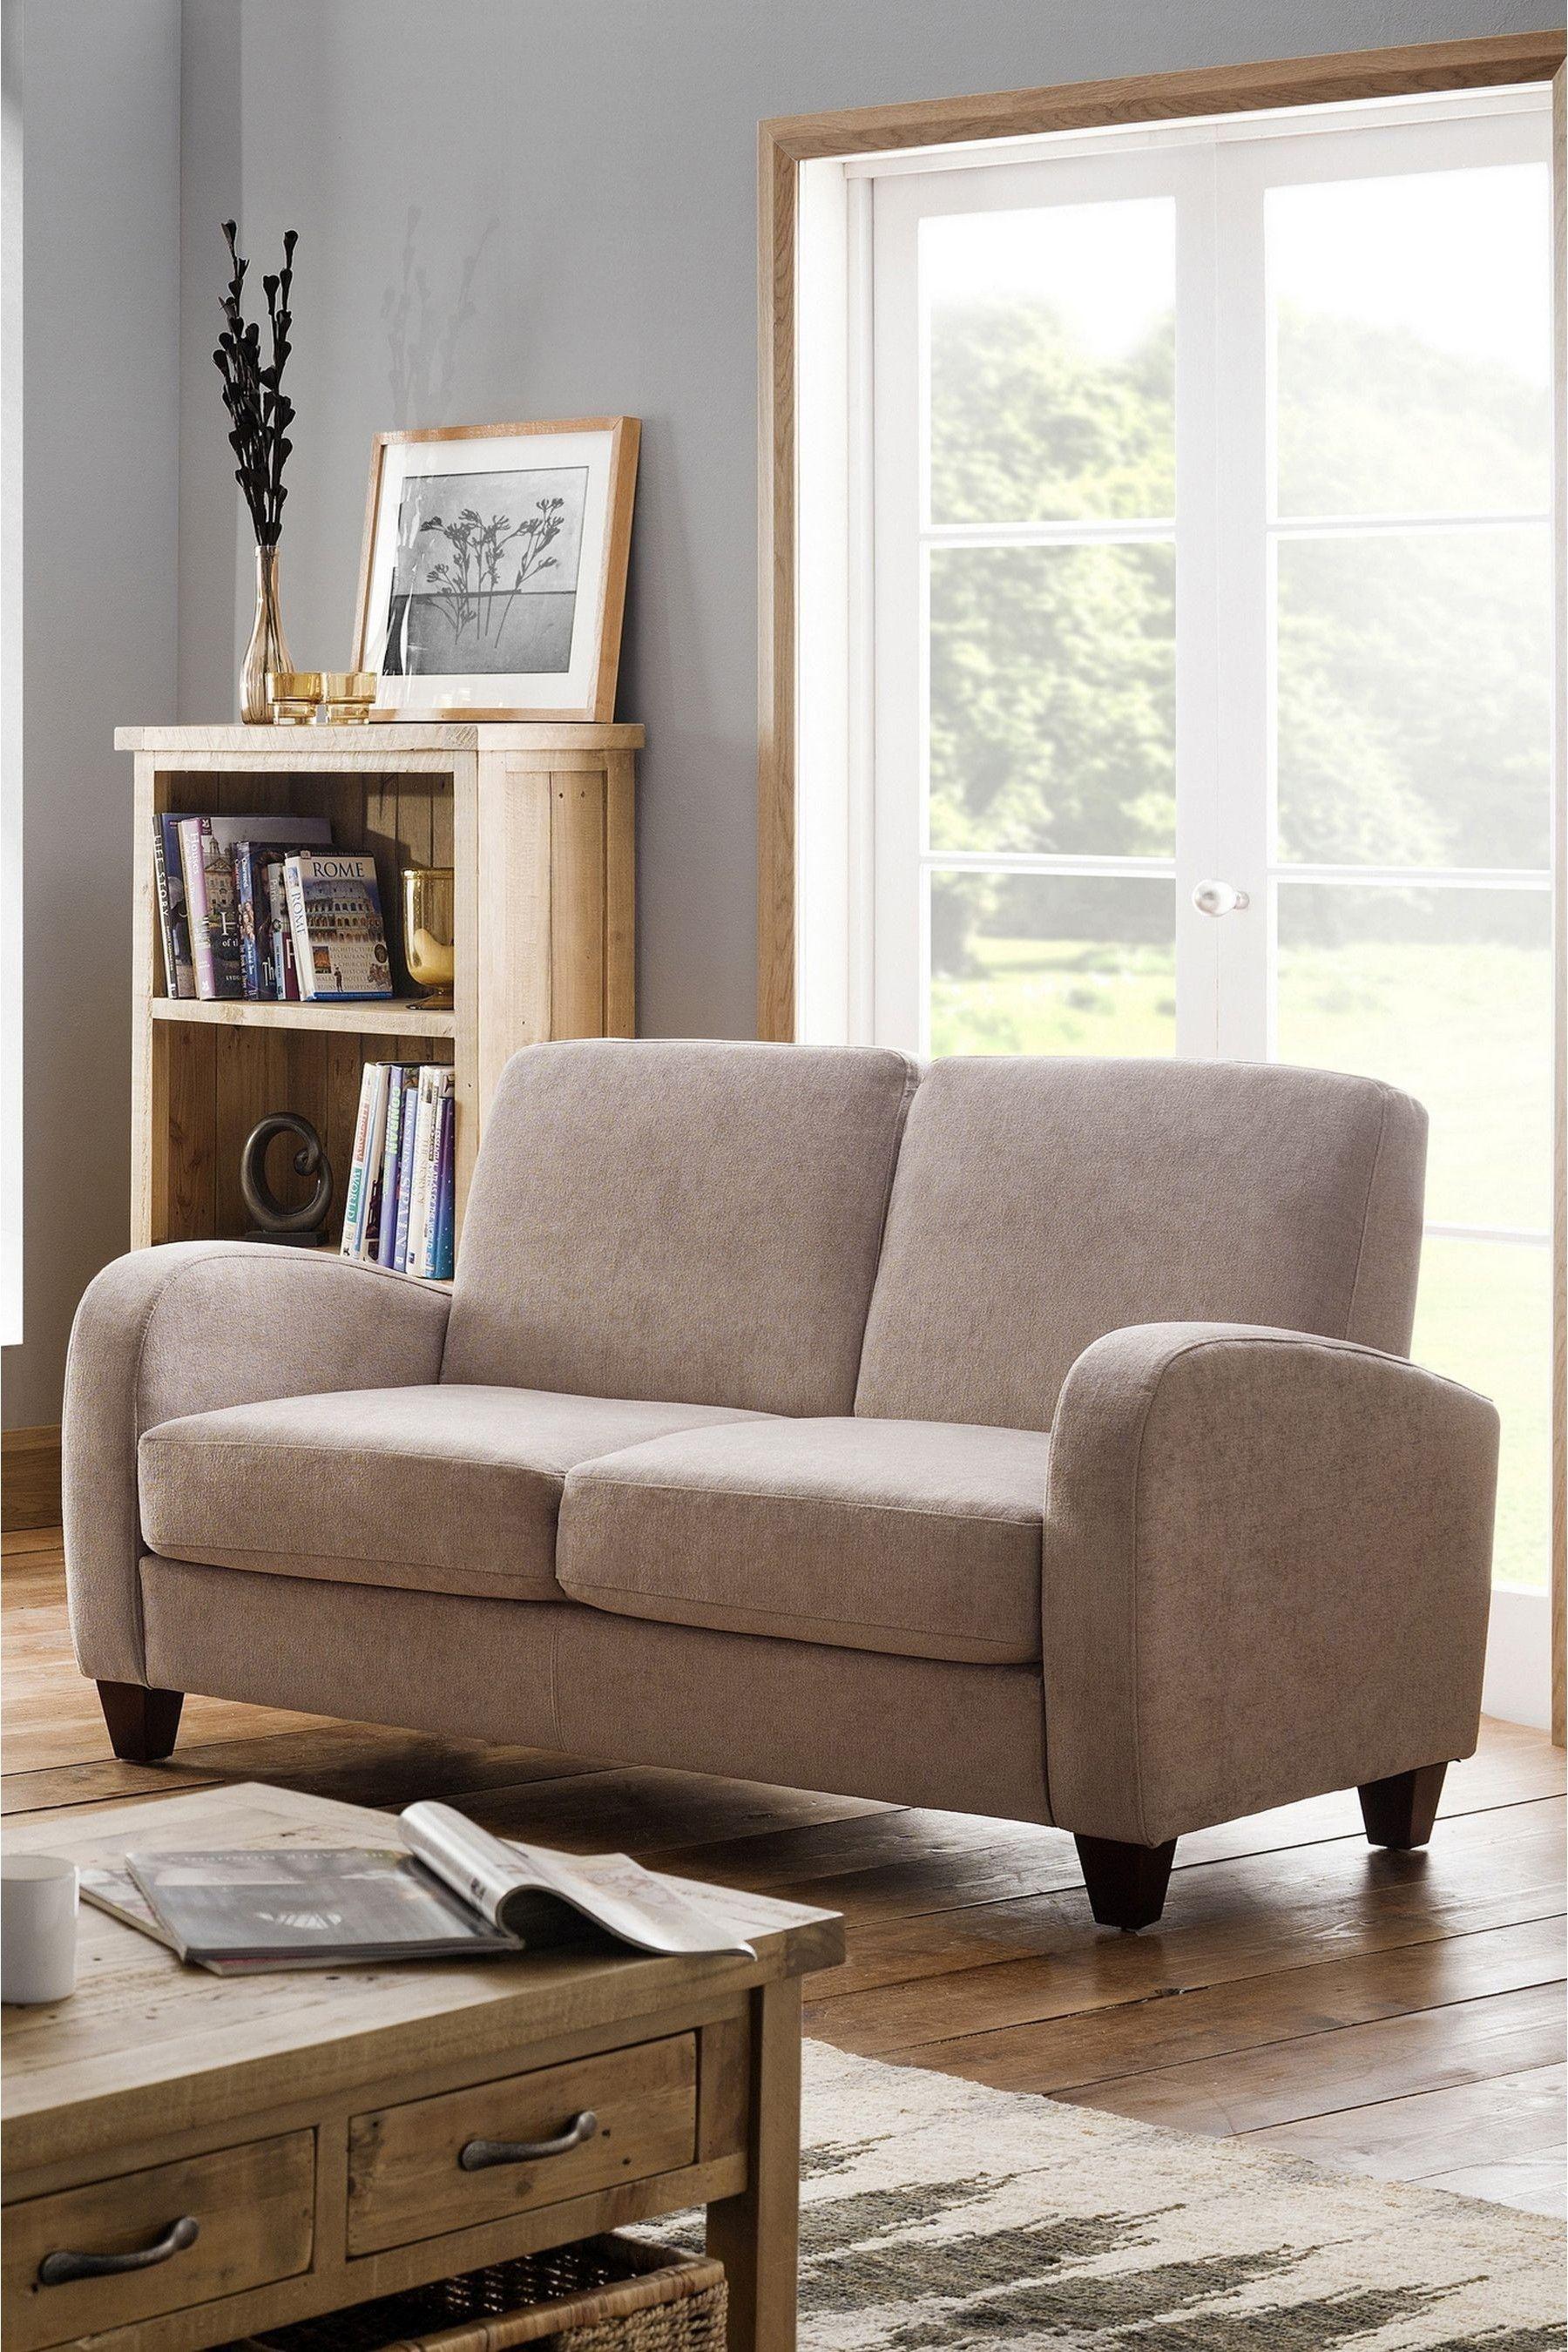 Vivo Mink Sofa Bed By Julian Bowen In 2020 Sofa Bed Buy Sofa